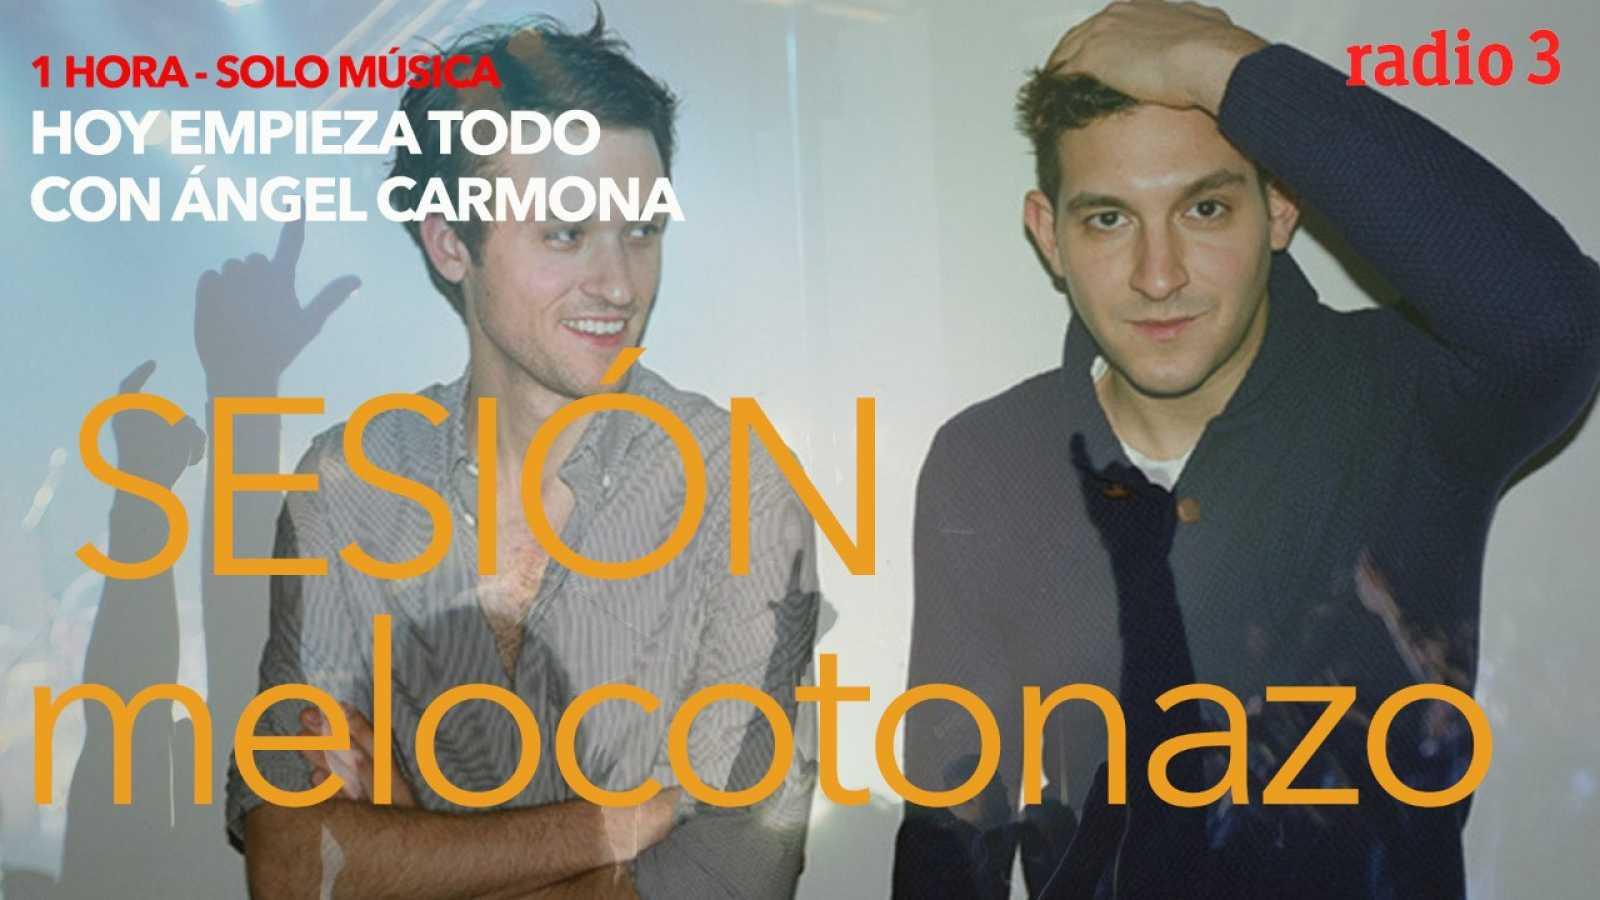 Hoy empieza todo con Ángel Carmona - #SesiónMelocotonazo: My Chemical Romance, Holy Ghost!, Lisasinson... - 09/04/21 - escuchar ahora